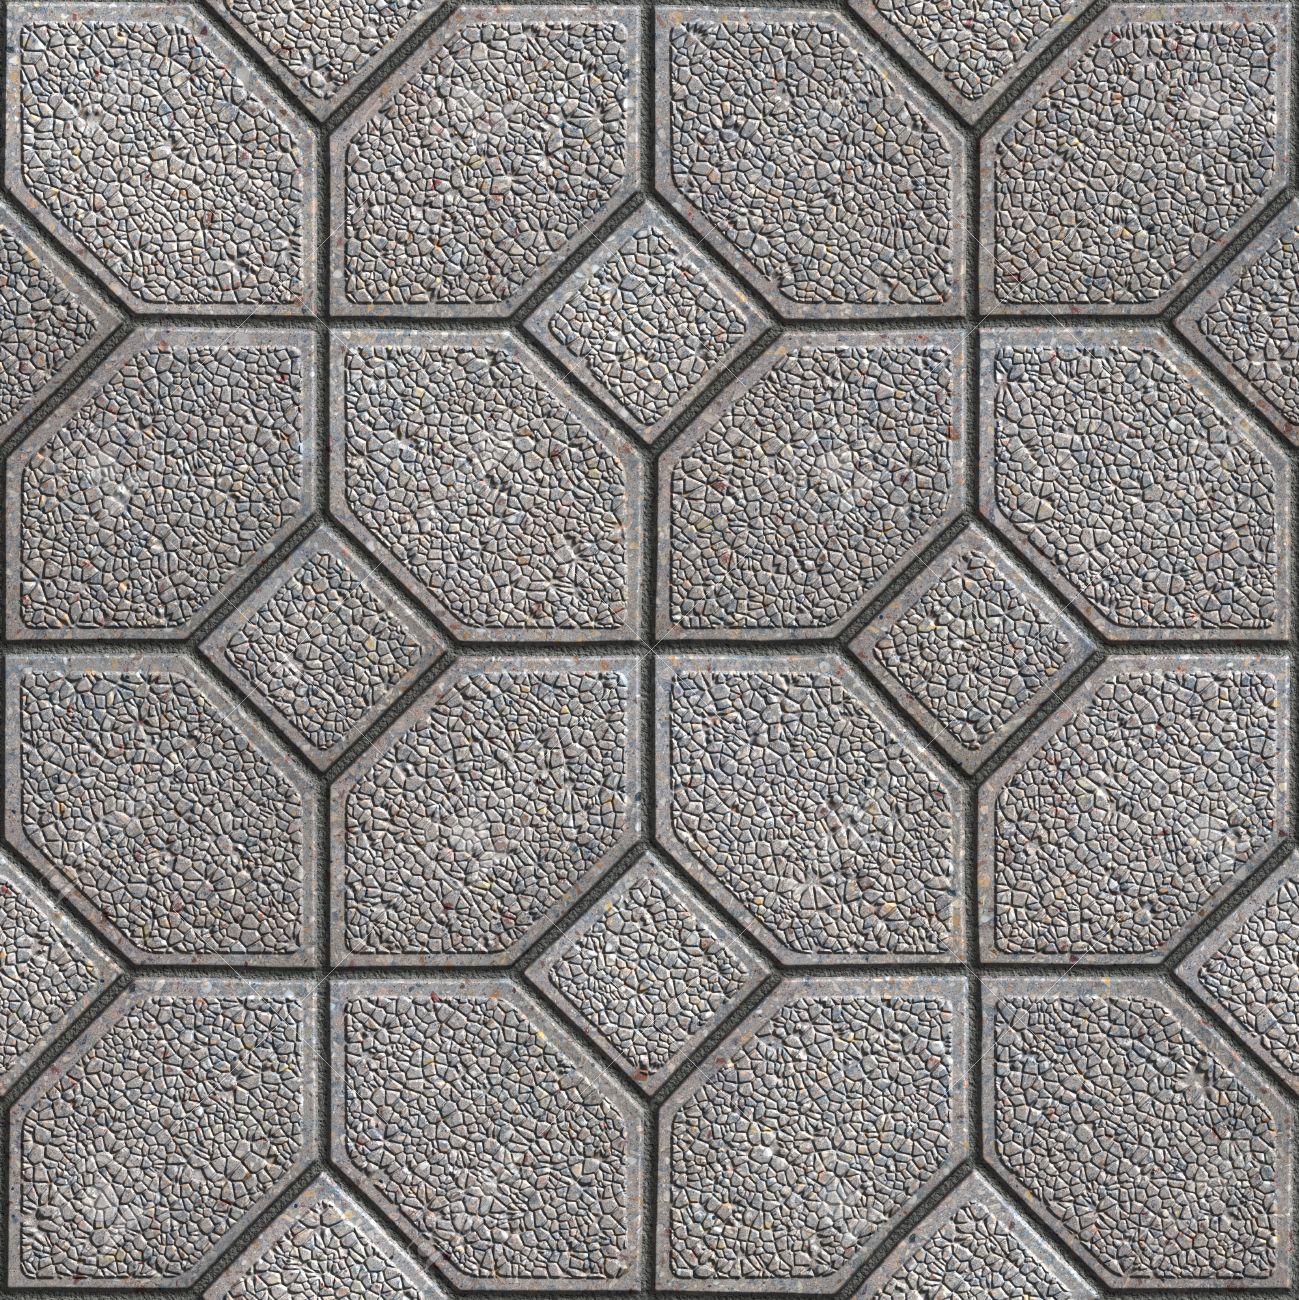 gray granular pavement of four hexagons around the square seamless